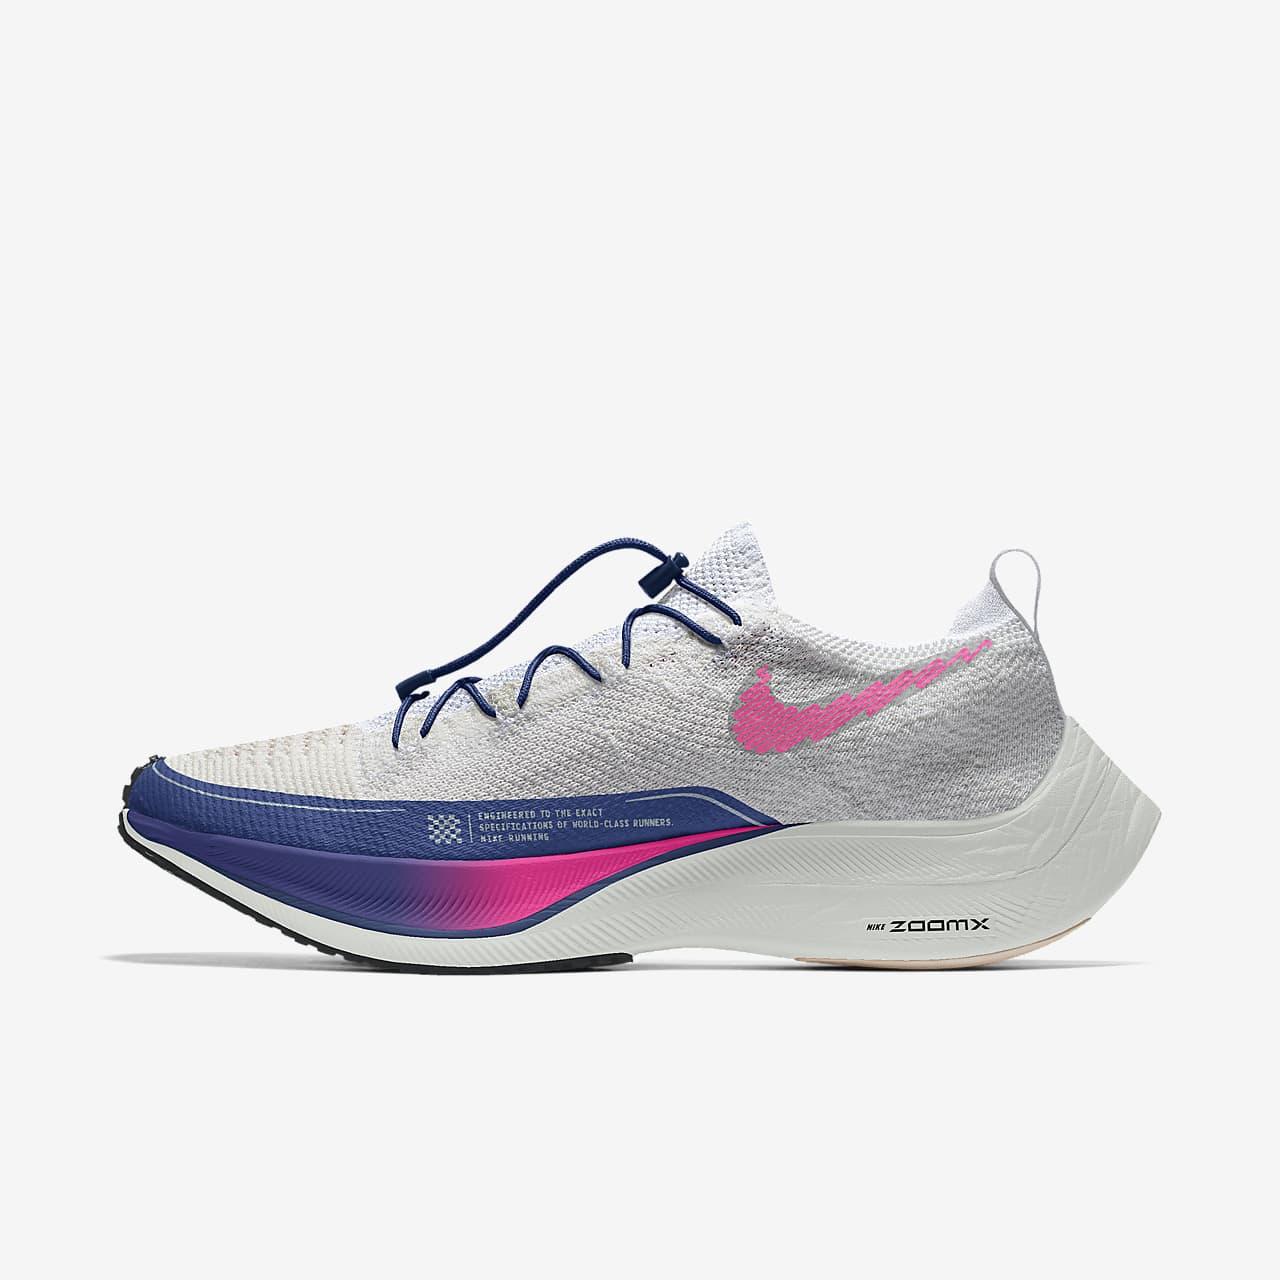 Nike ZoomX Vaporfly NEXT% 2 By You Custom Men's Running Shoe